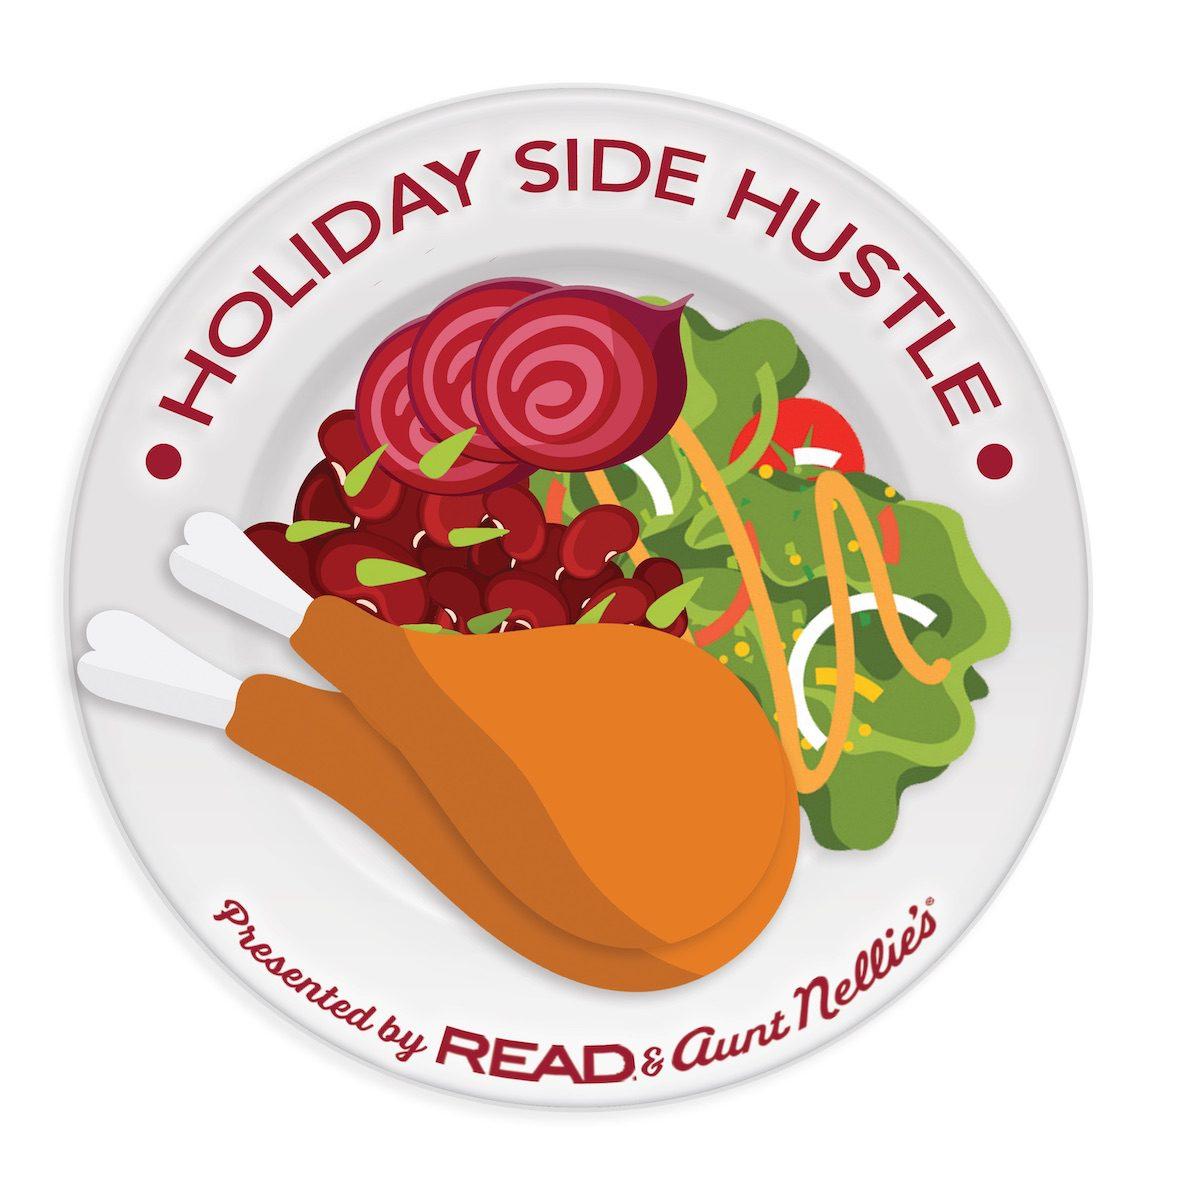 M&P logo for Holiday Side Hustle